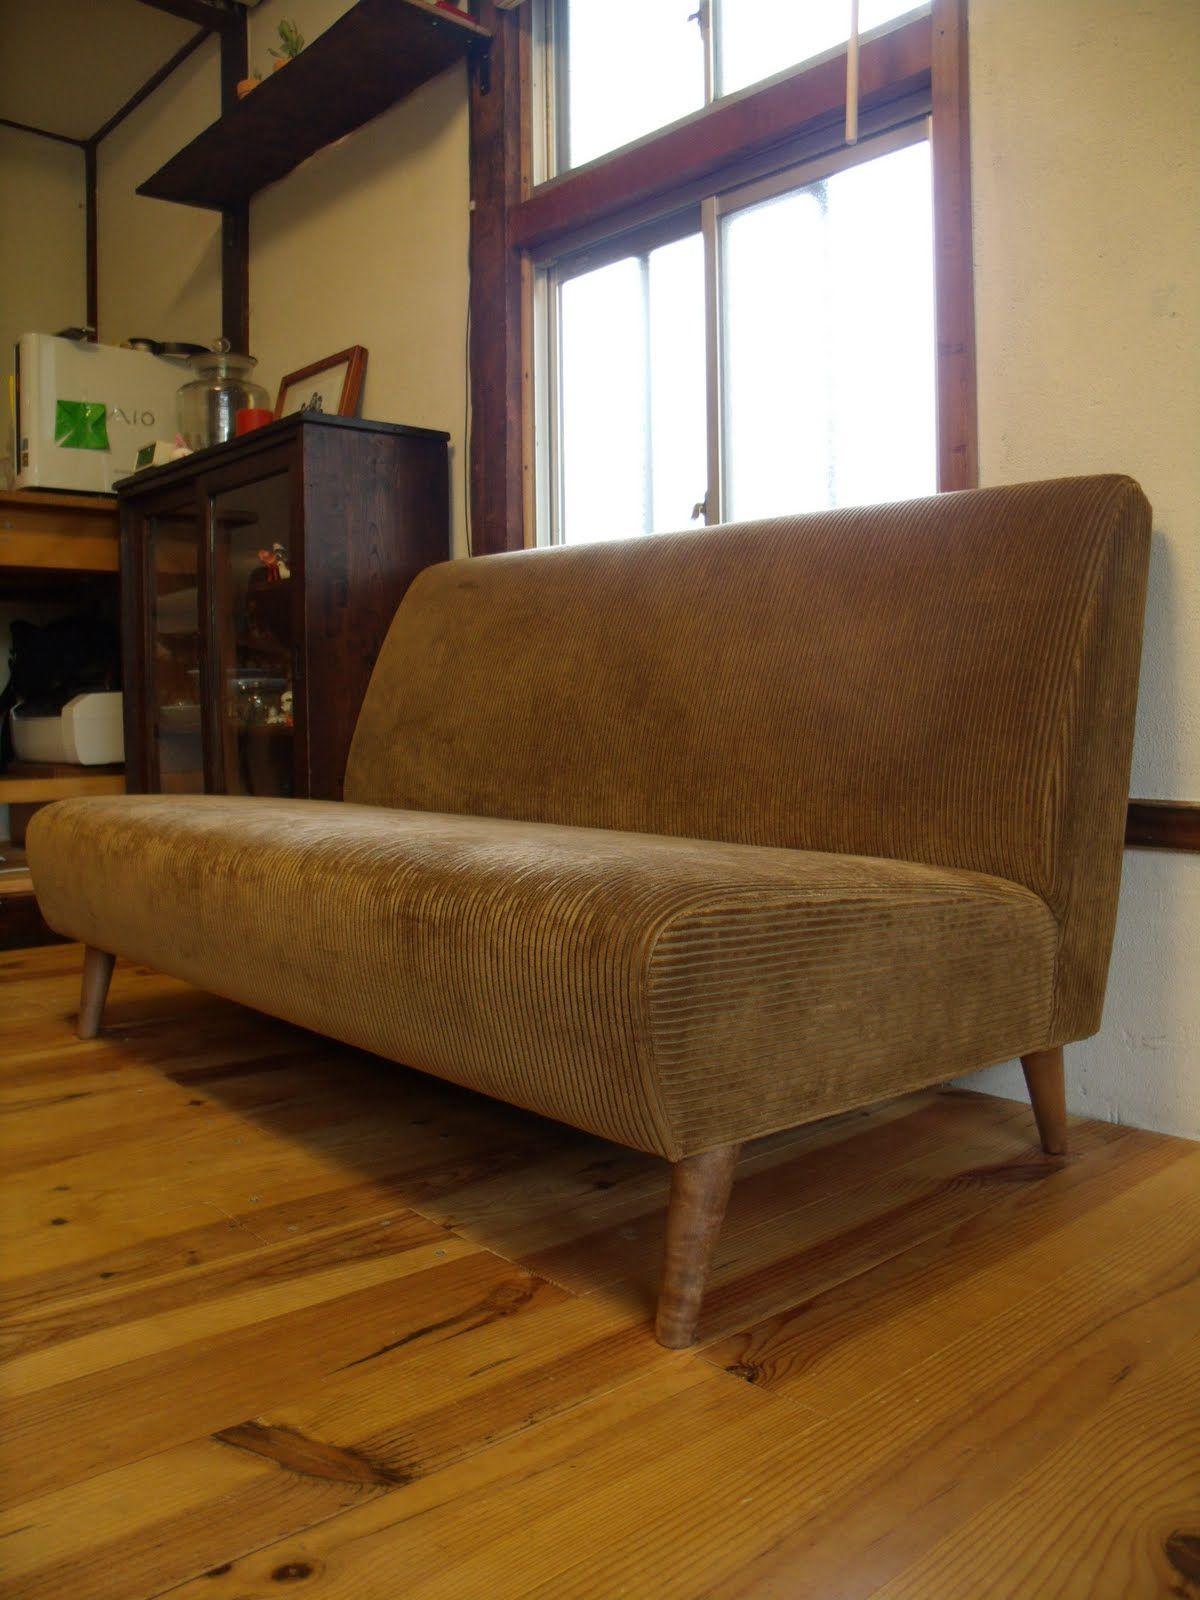 Life Architect Blog Truck Furniture 家具のアイデア 椅子 ソファー インテリア